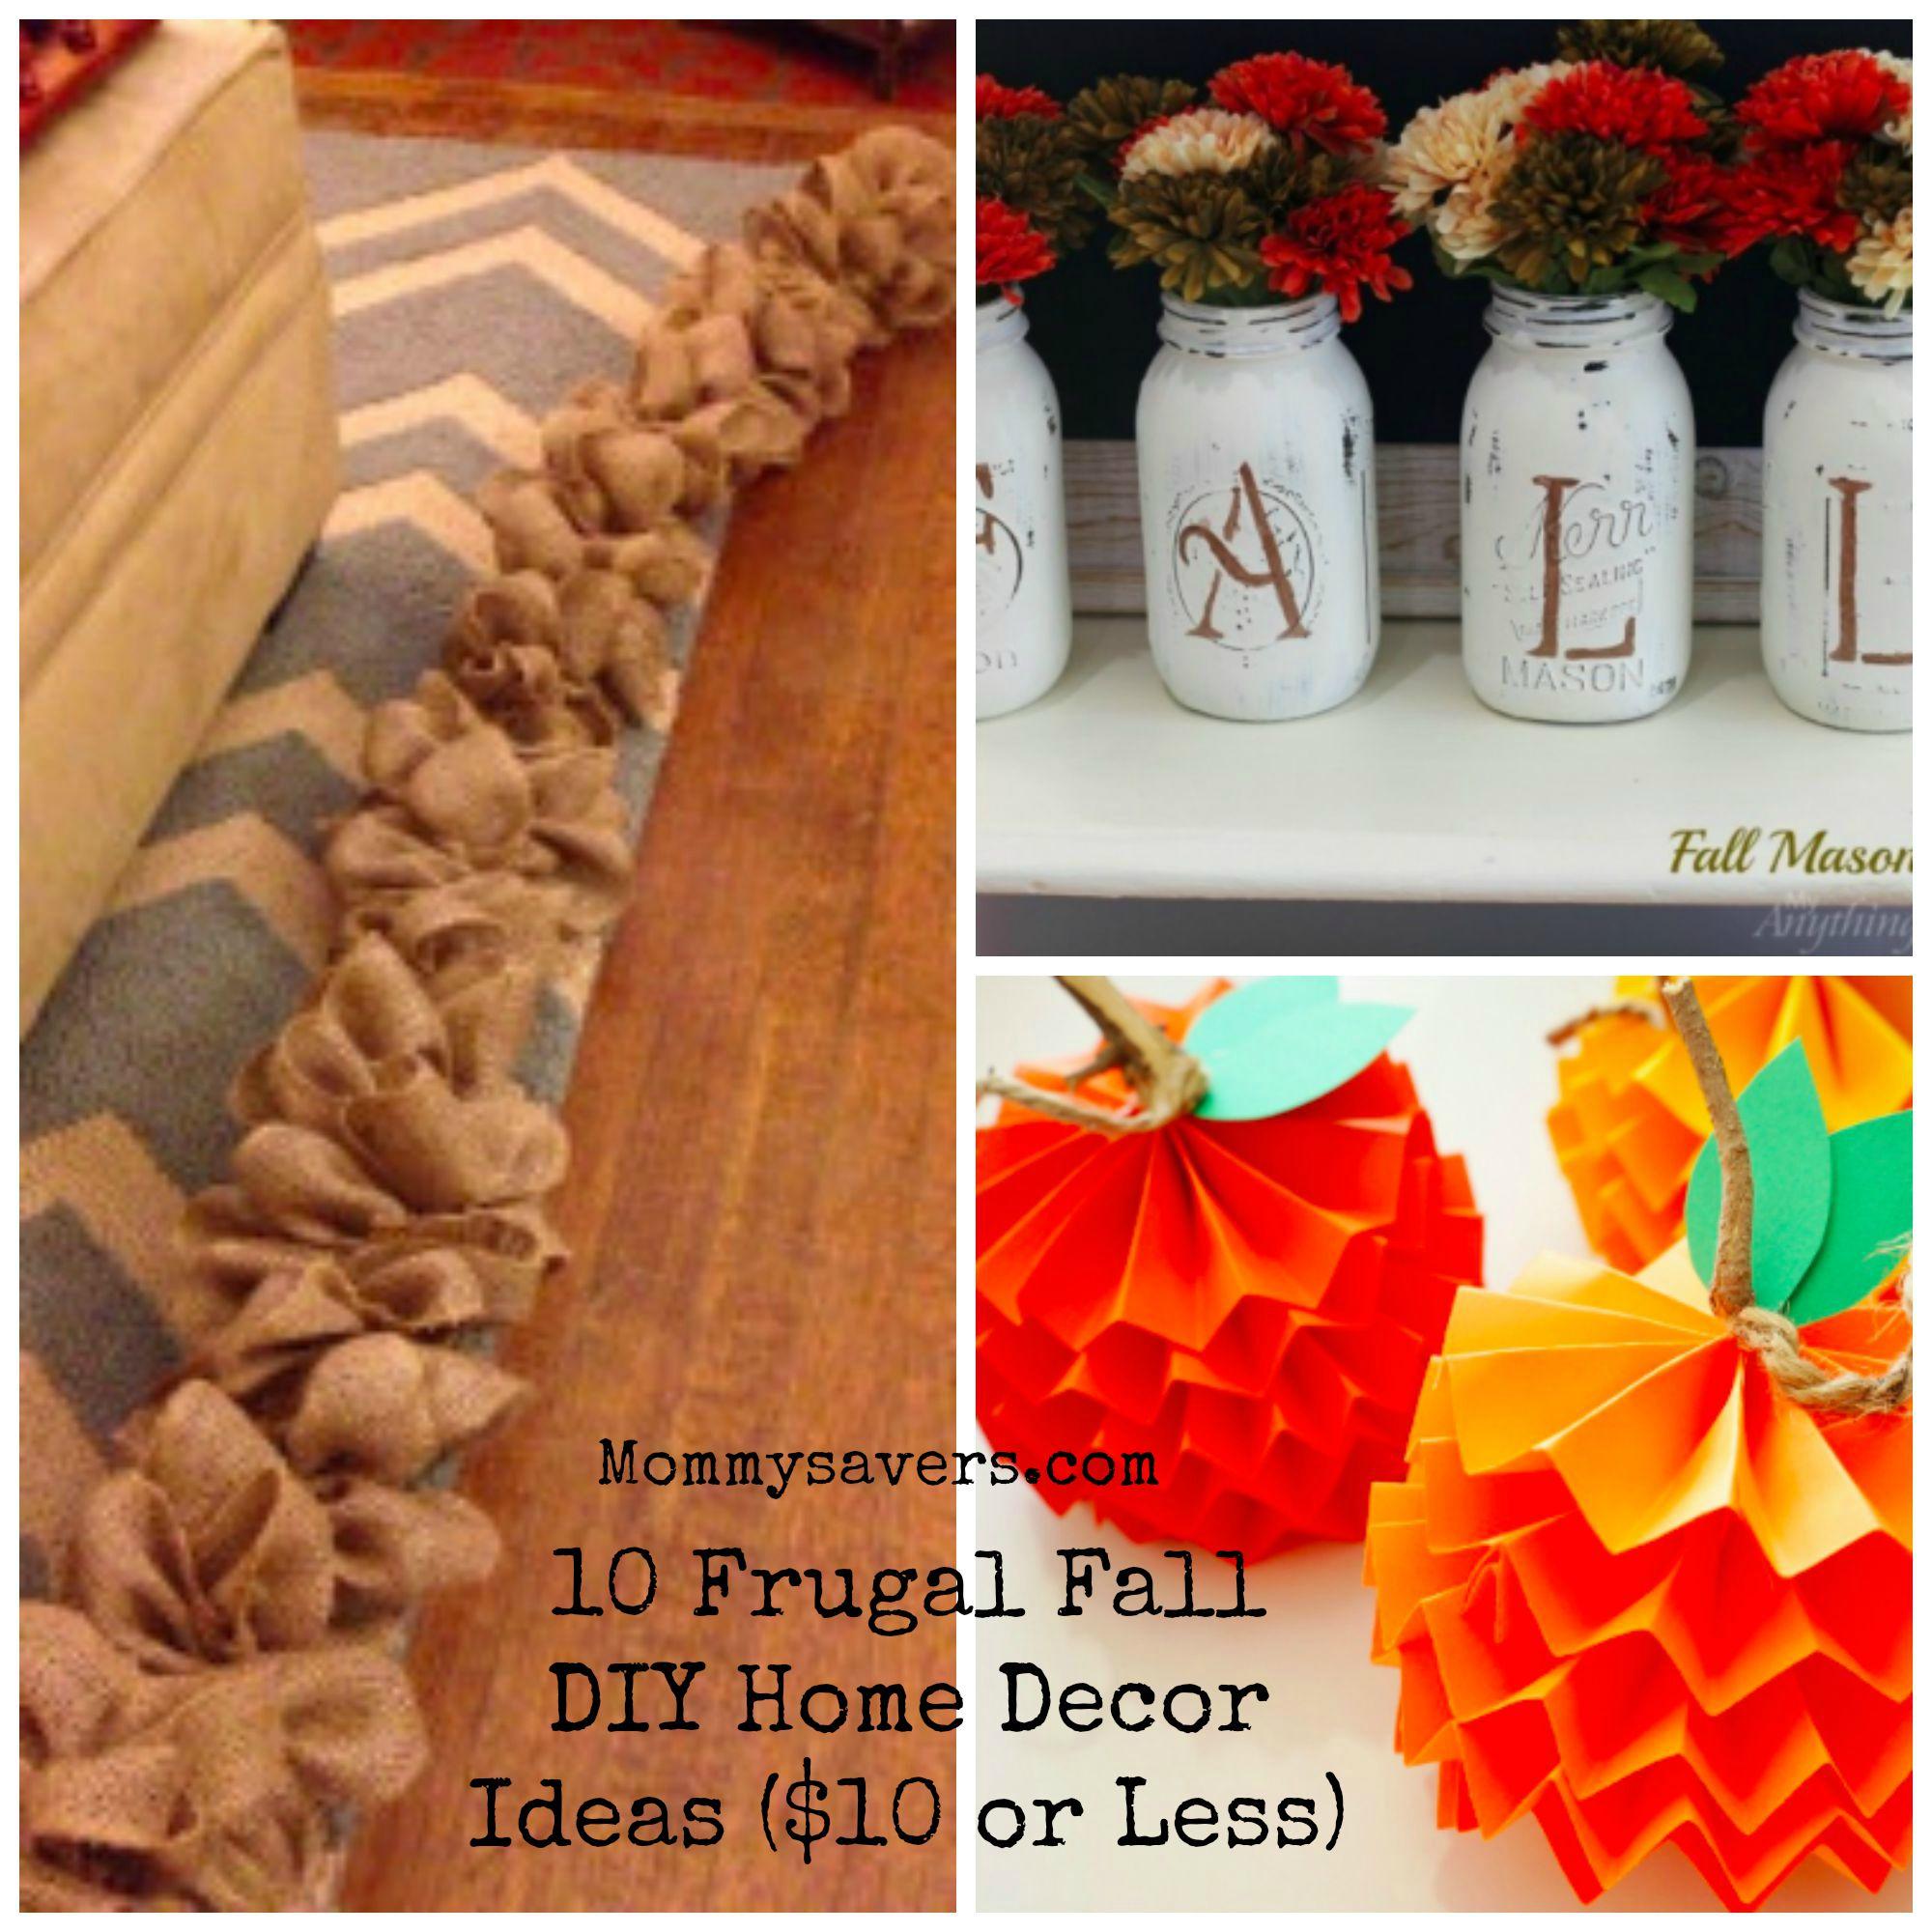 10 Frugal Fall DIY Home Decor Ideas 10 or Less